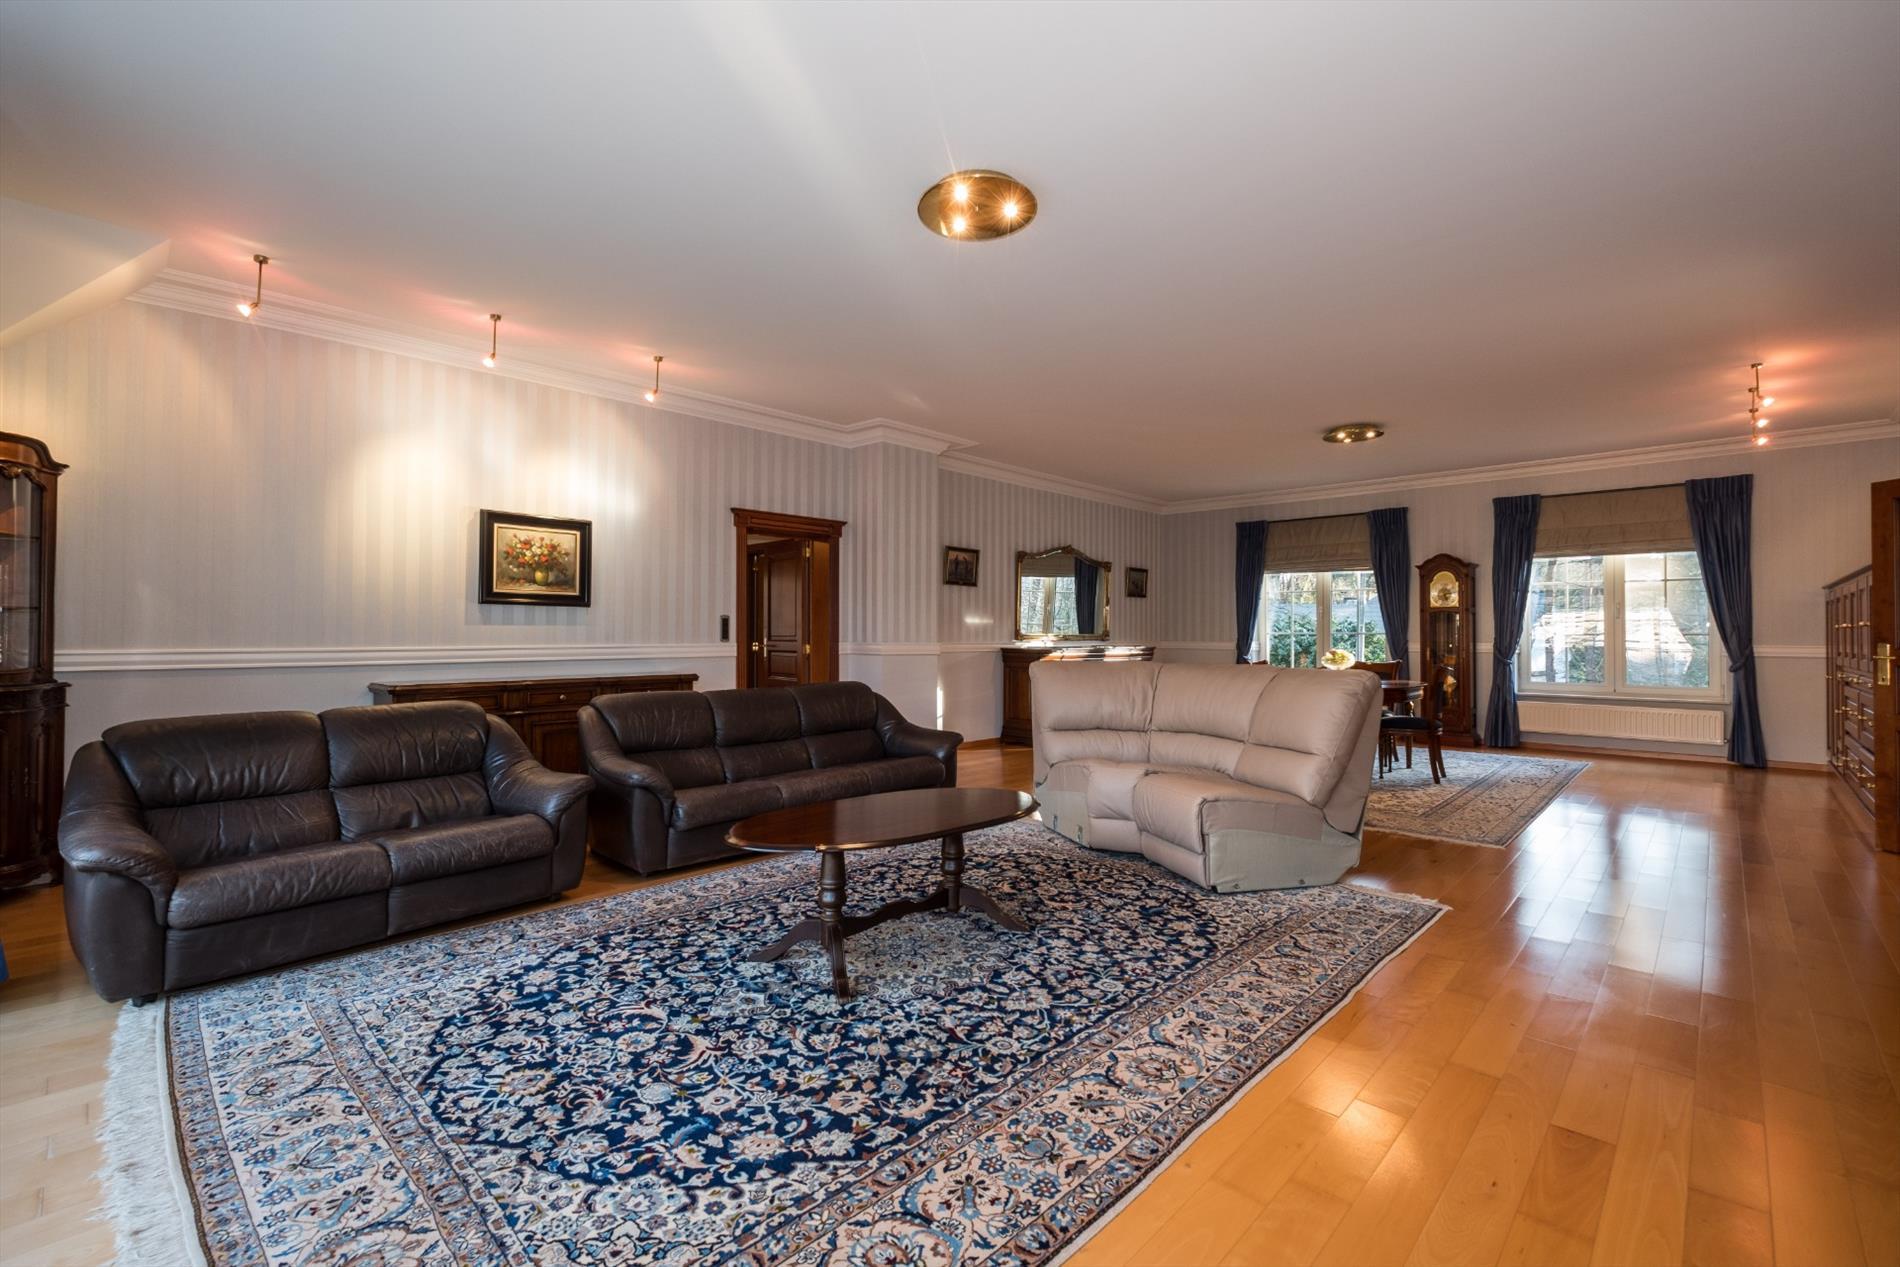 Ruime villa met 4 slaapkamers, 3 badkamers, luxueus uitgeruste ...